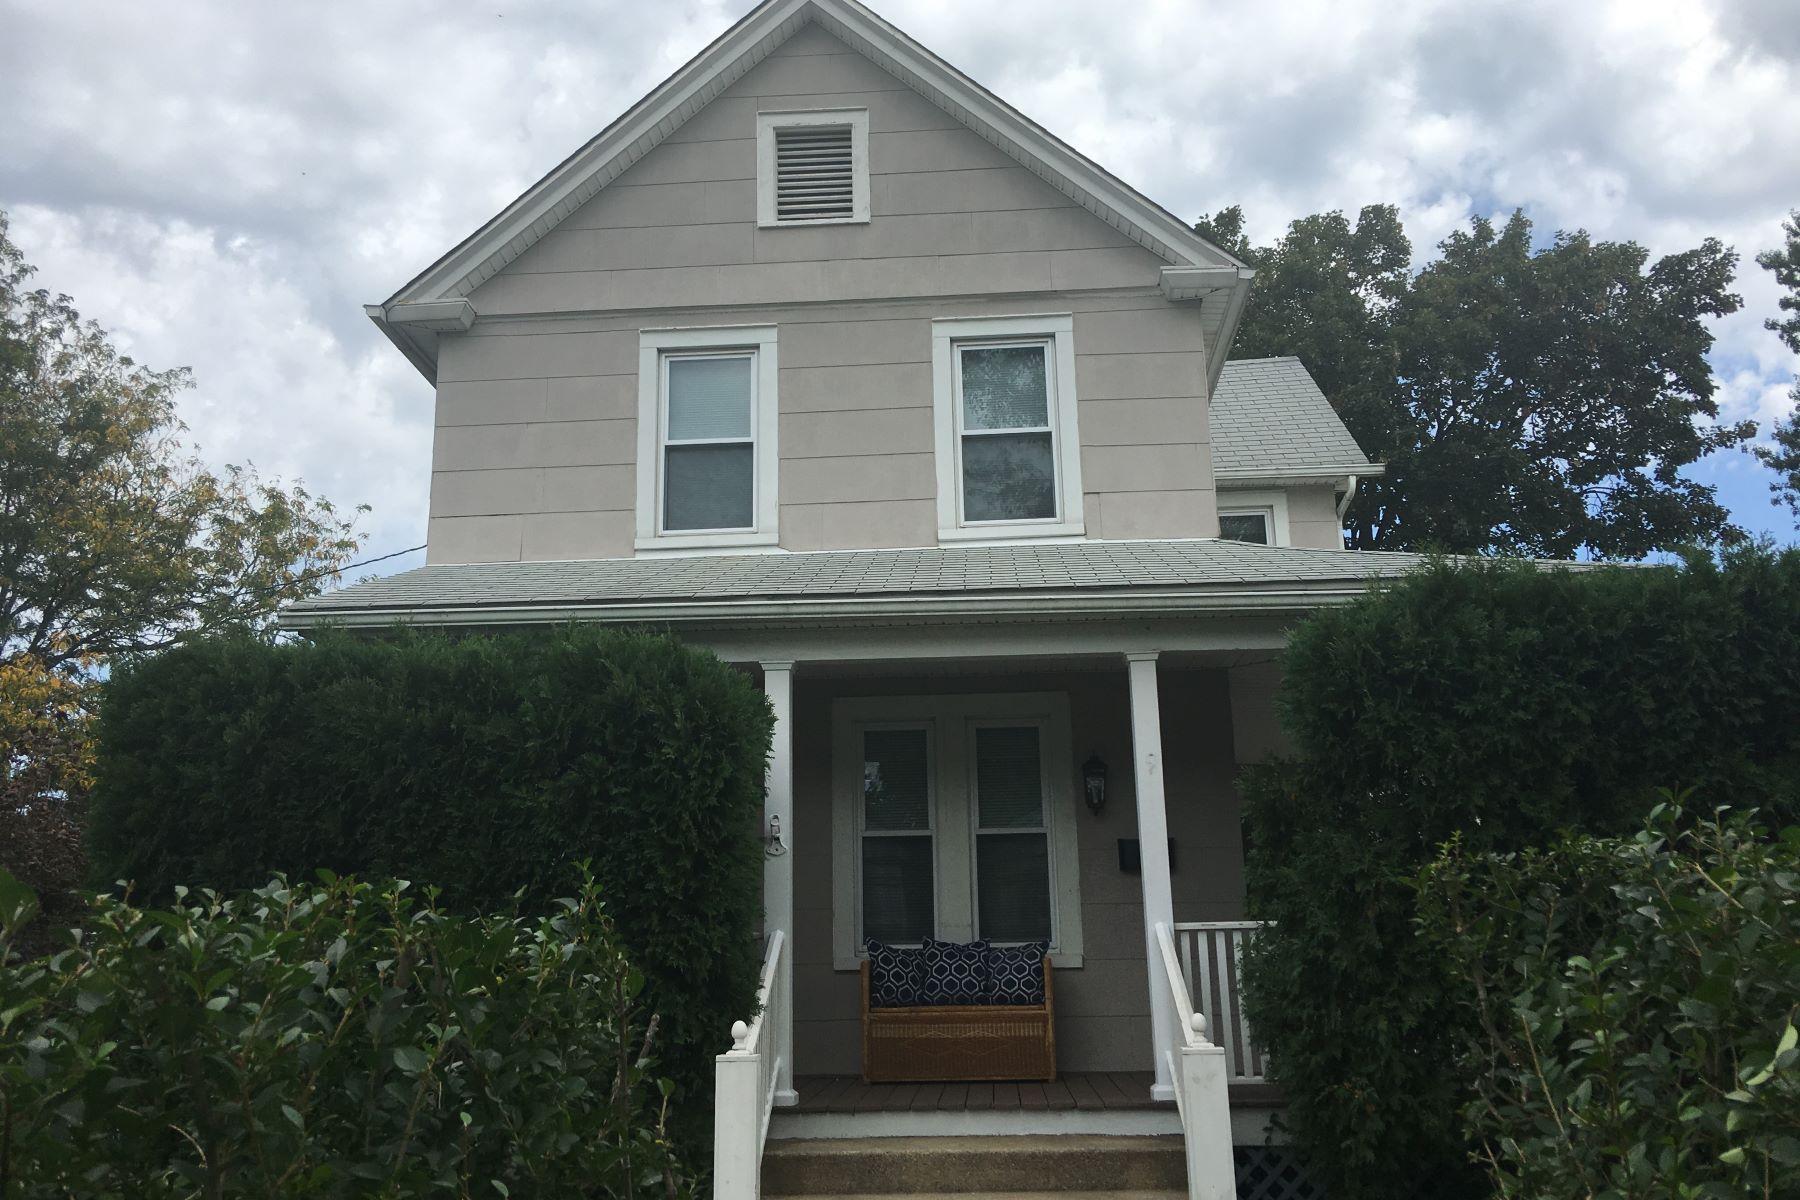 Property للـ Rent في Port Washington 9 N Maryland Ave, Port Washington, New York 11050 United States